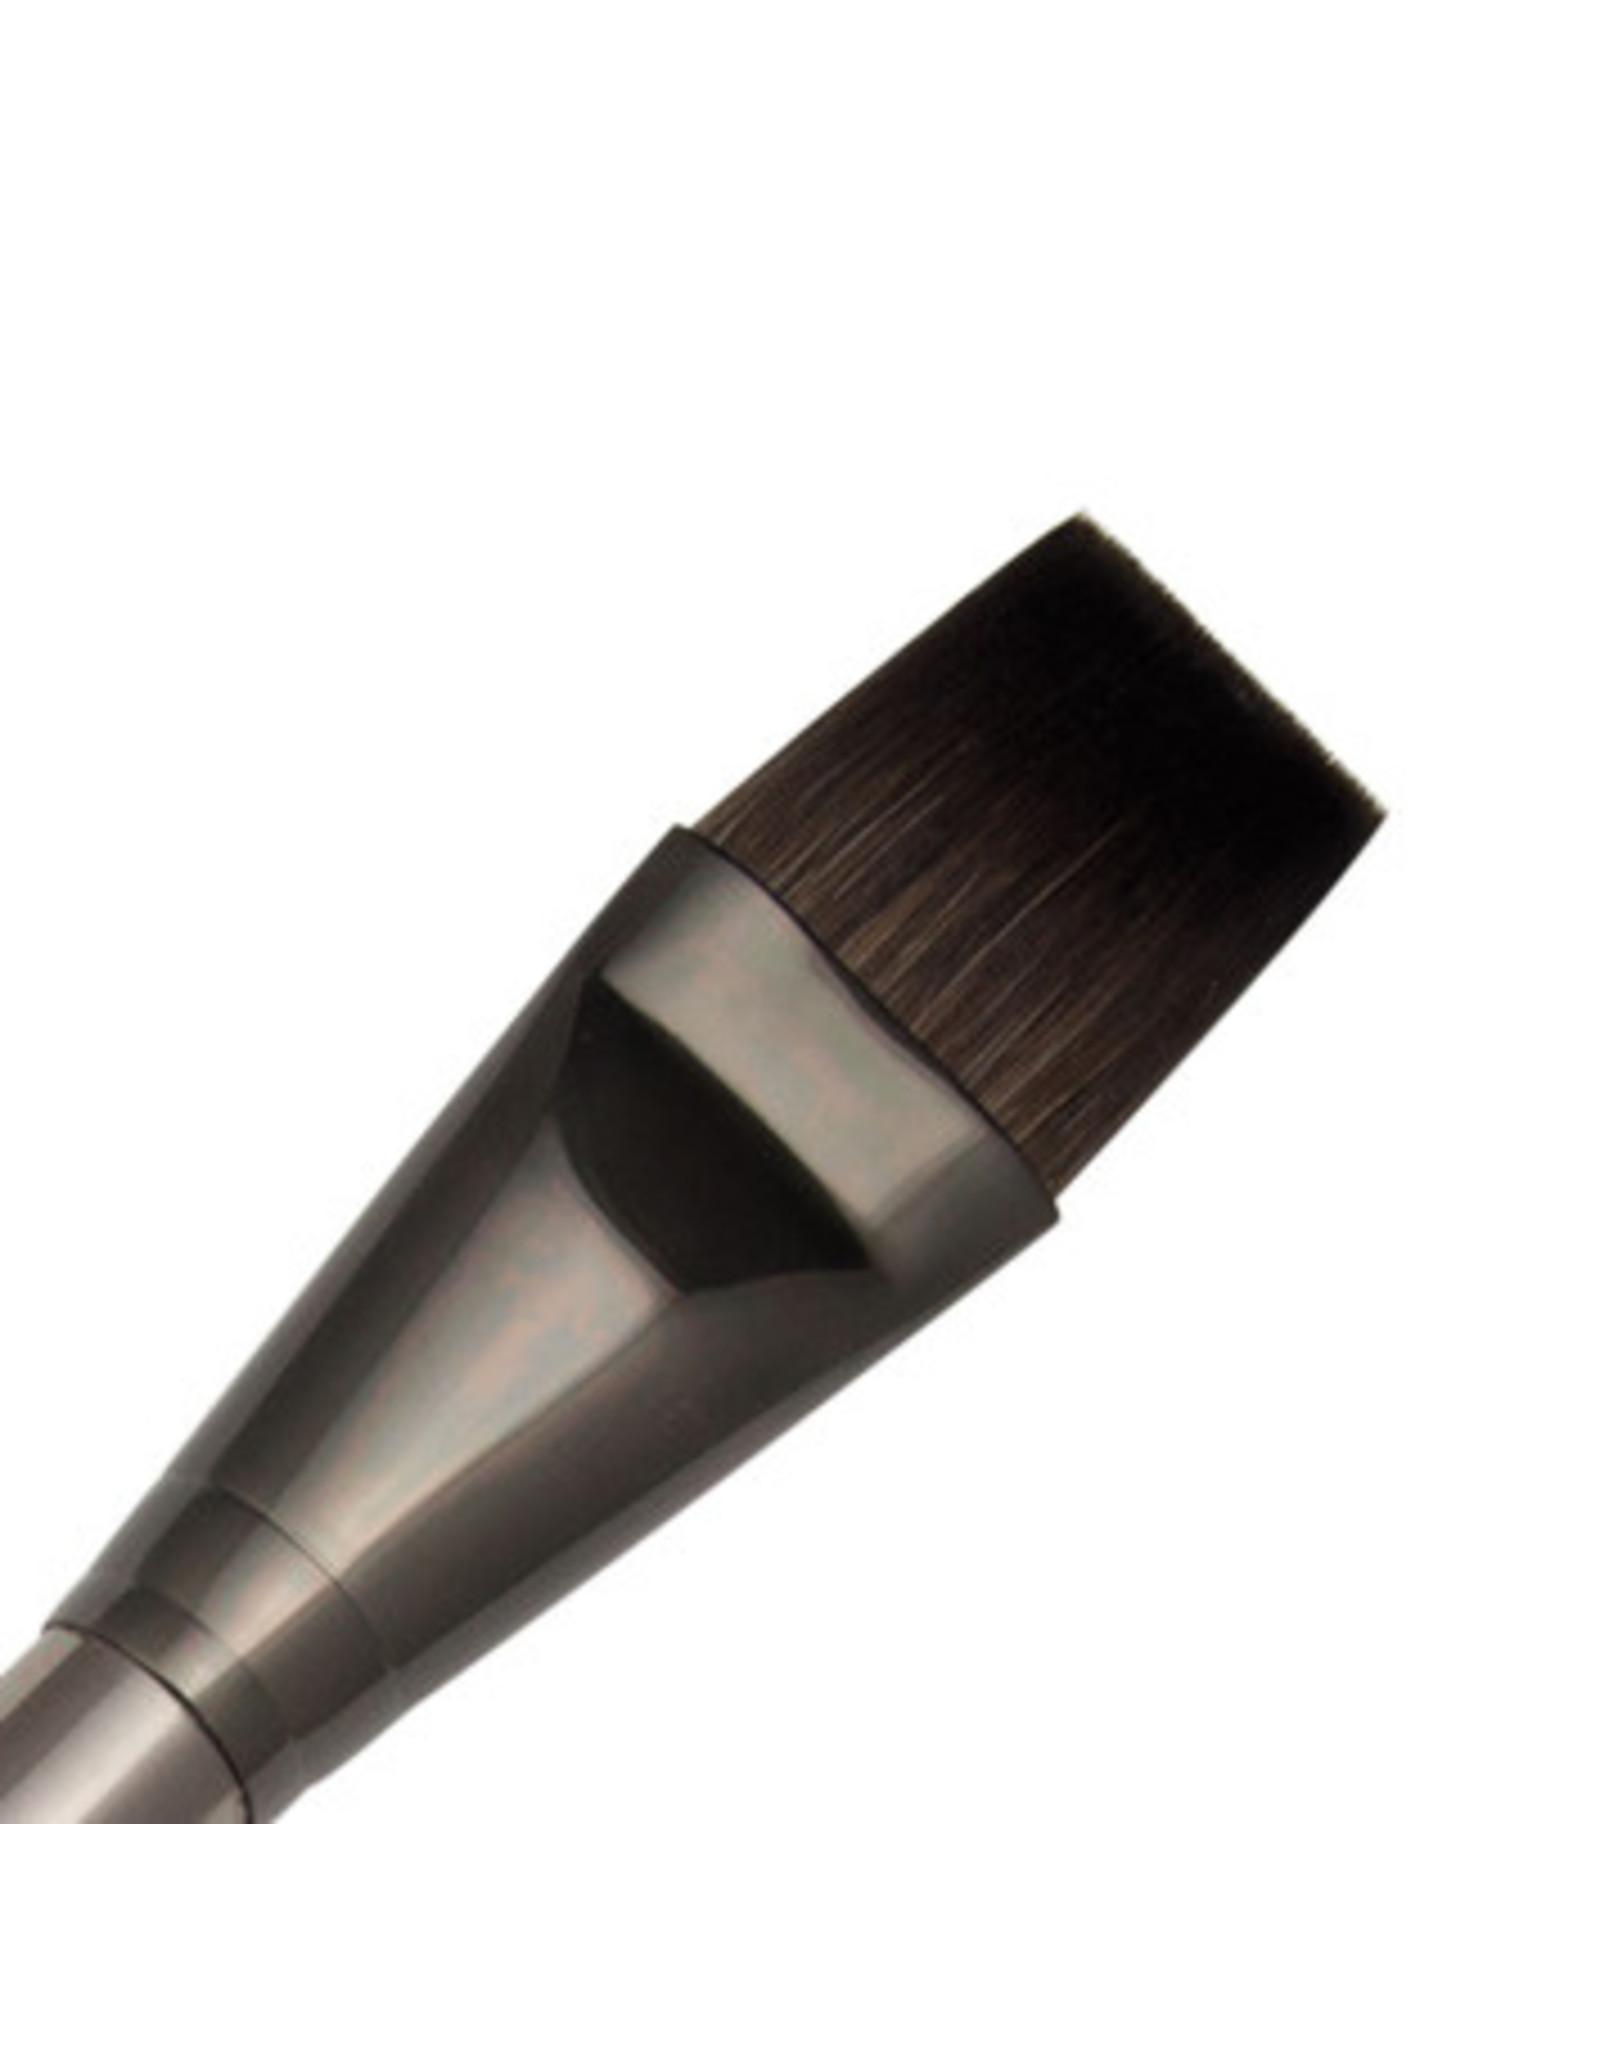 Royal & Langnickel Zen 83 Series Wash 25mm brush